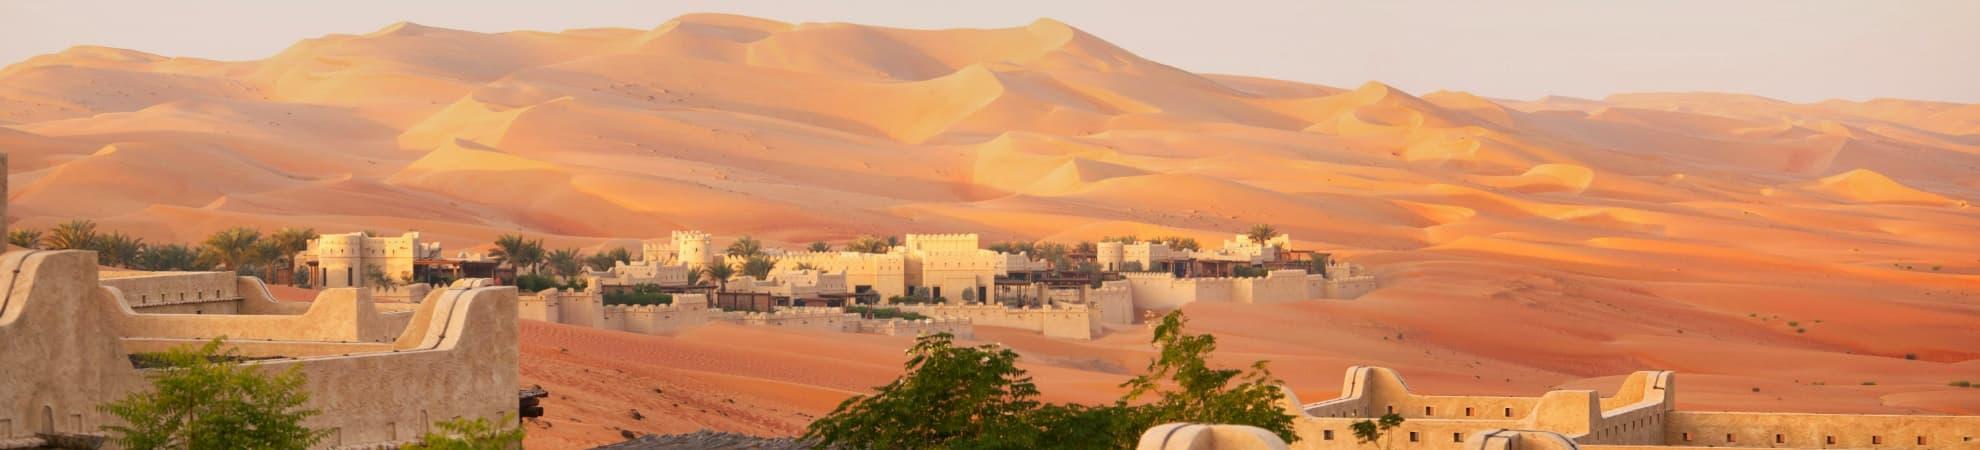 Voyage Luxe Moyen-Orient